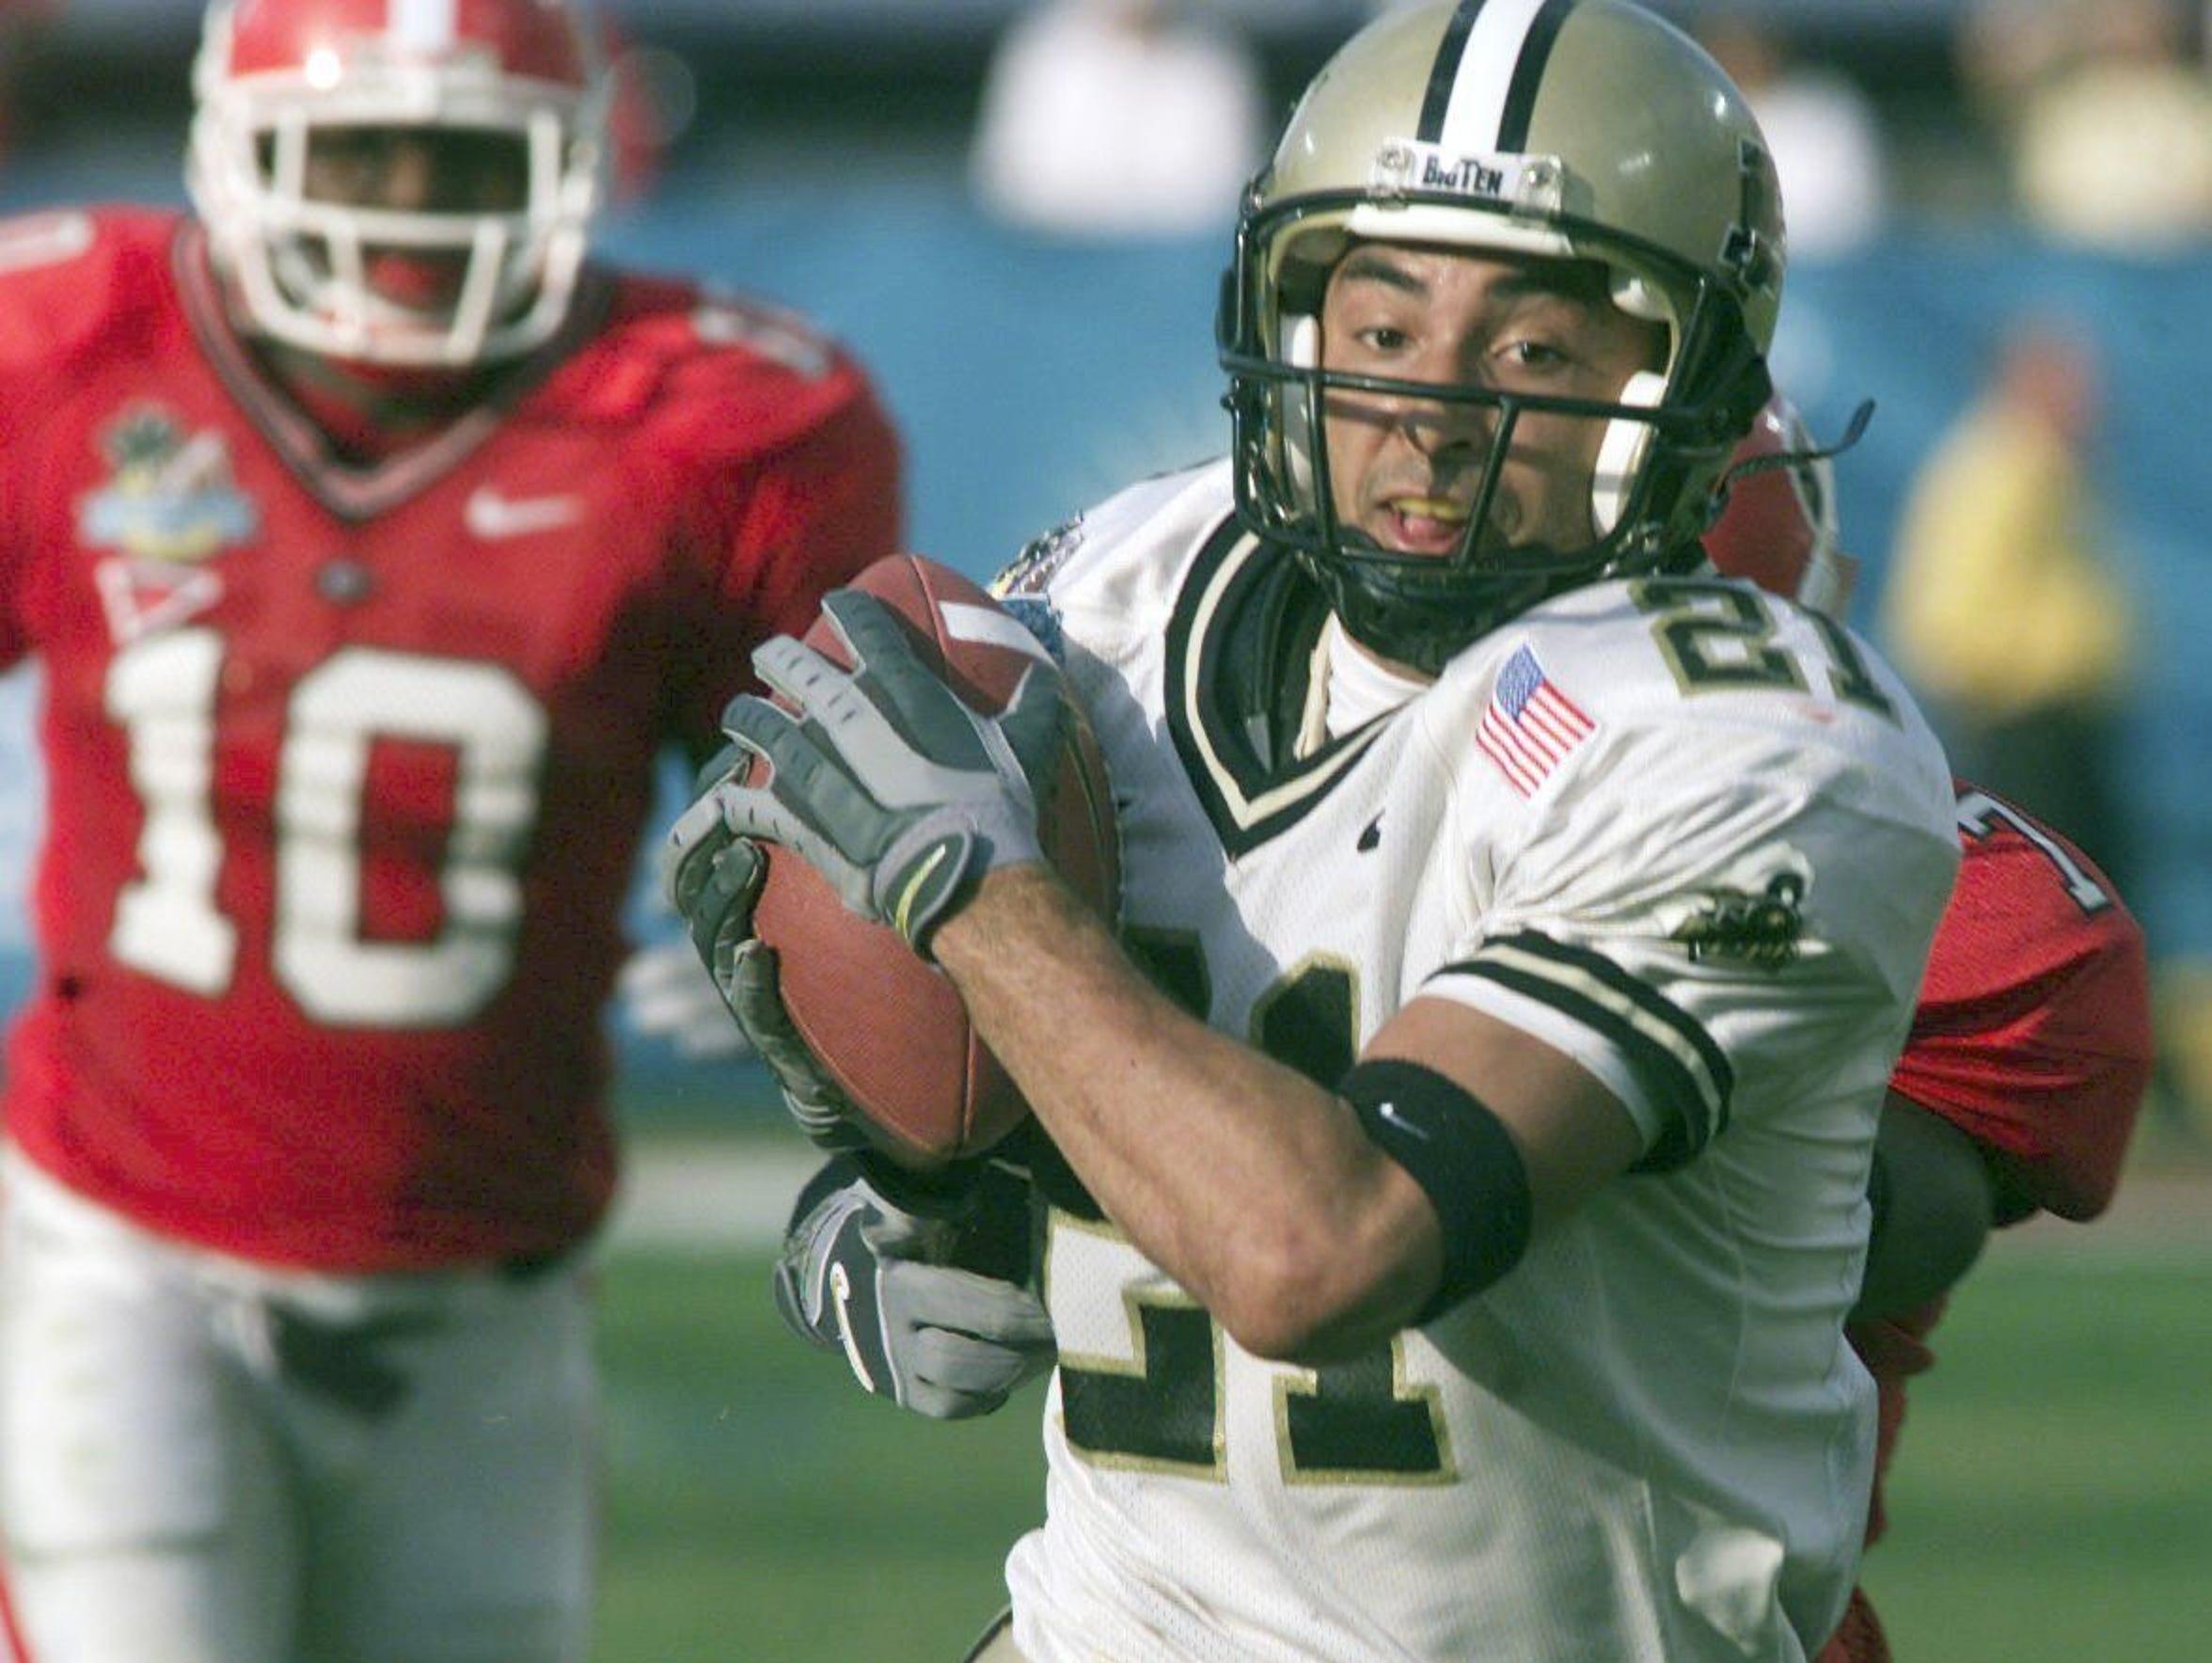 Purdue's Taylor Stubblefield set the NCAA career receptions